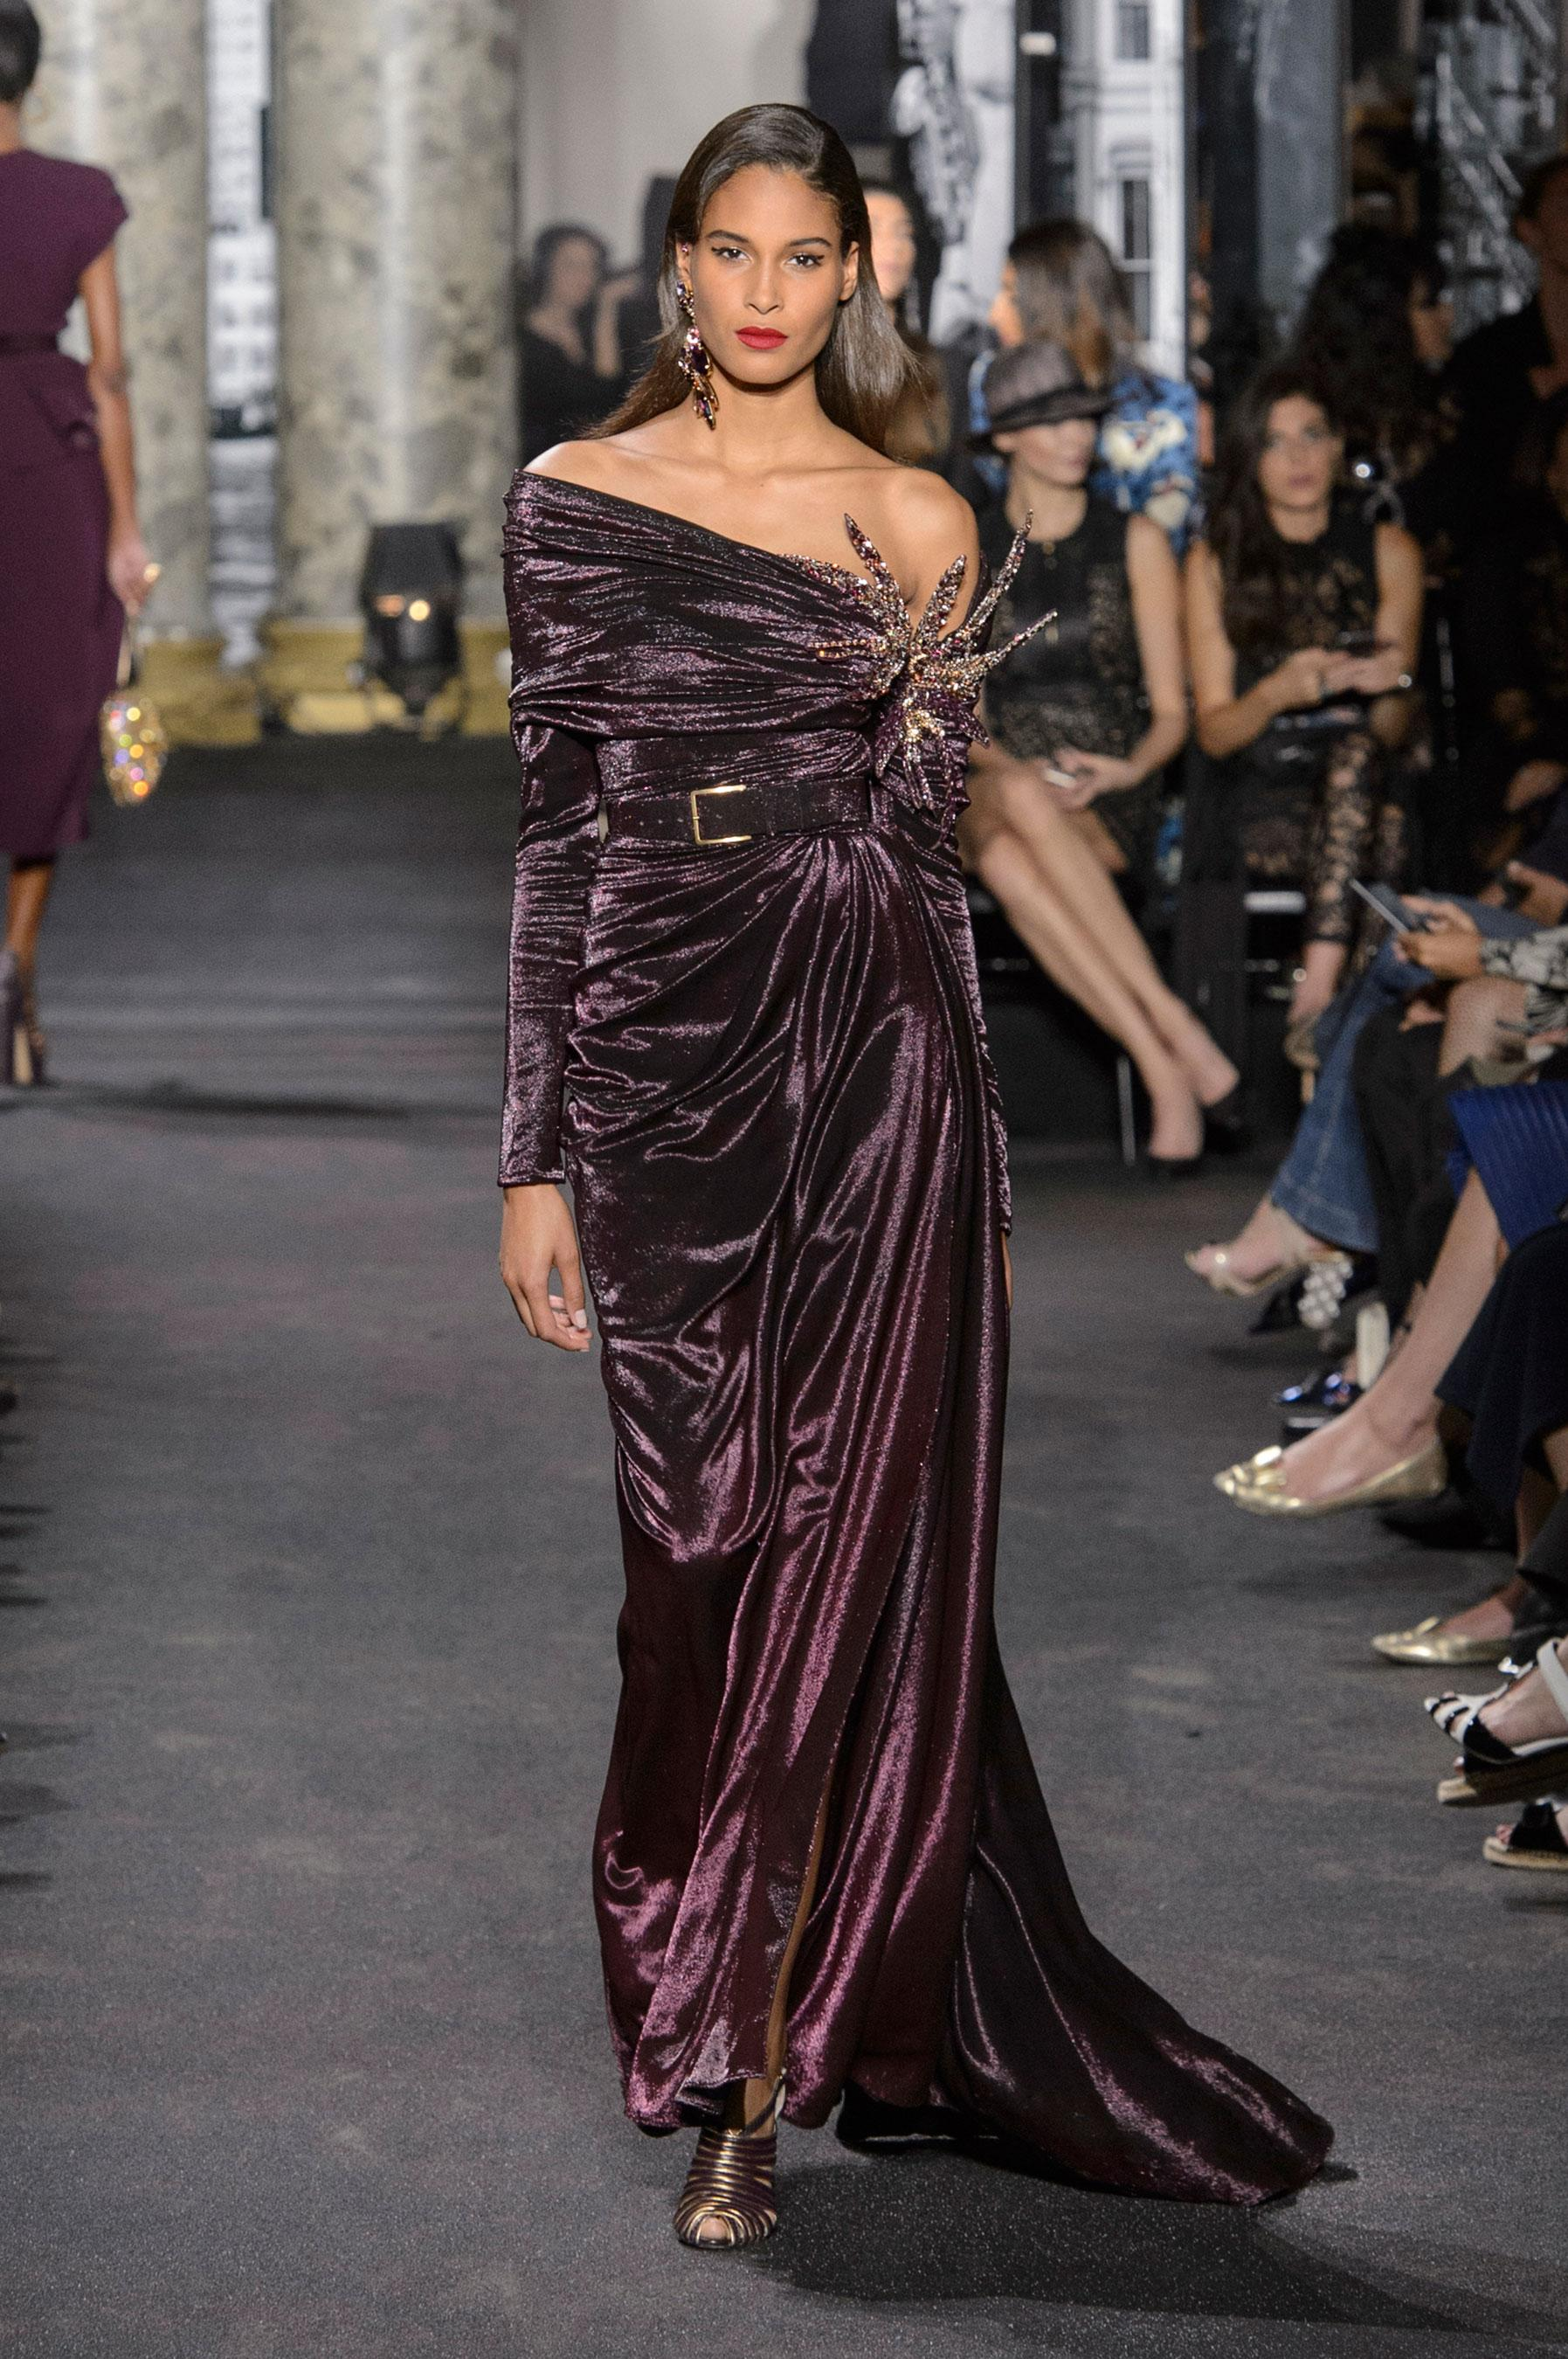 ede18c1f10f28 Défilé Elie Saab Automne-hiver 2016-2017 Couture - Madame Figaro